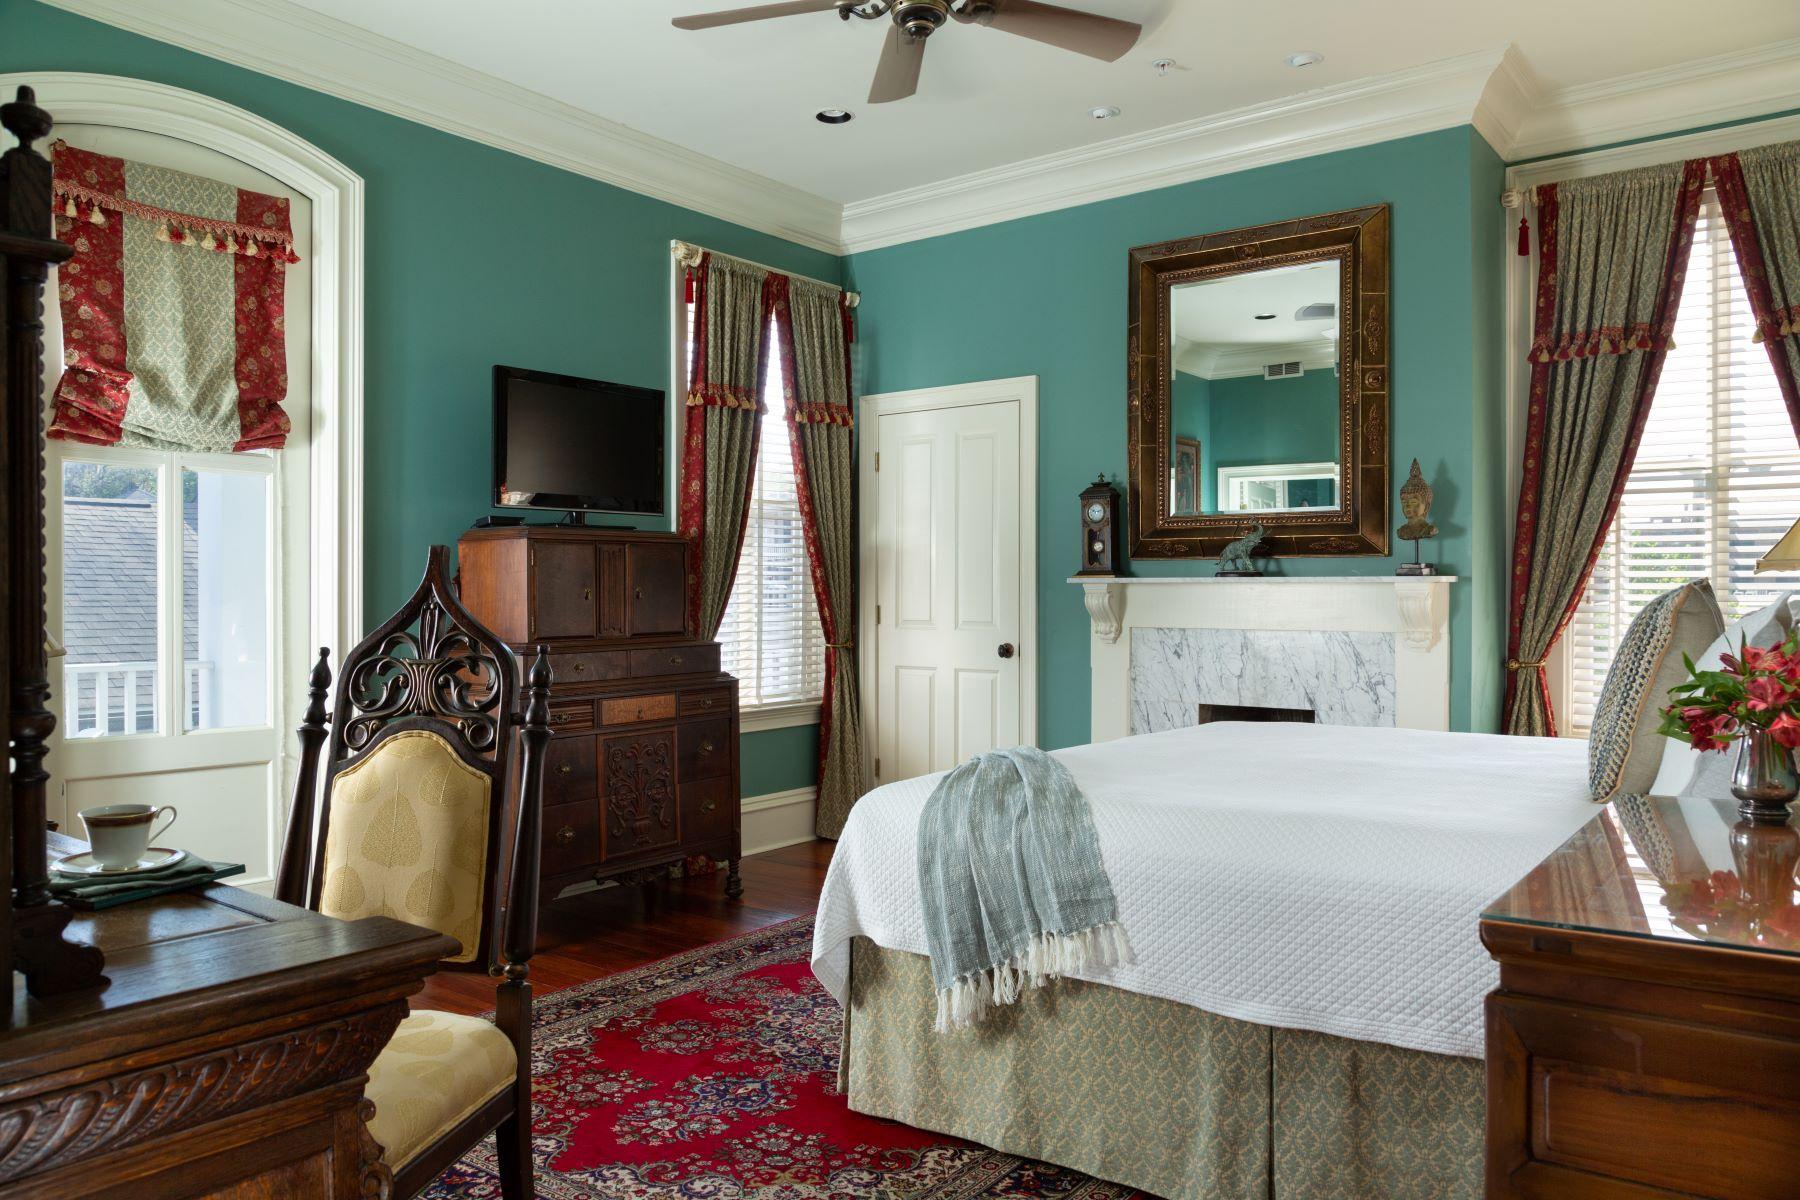 Inn-West-Liberty-Rooms-WrightSqaure-1Rev.jpg